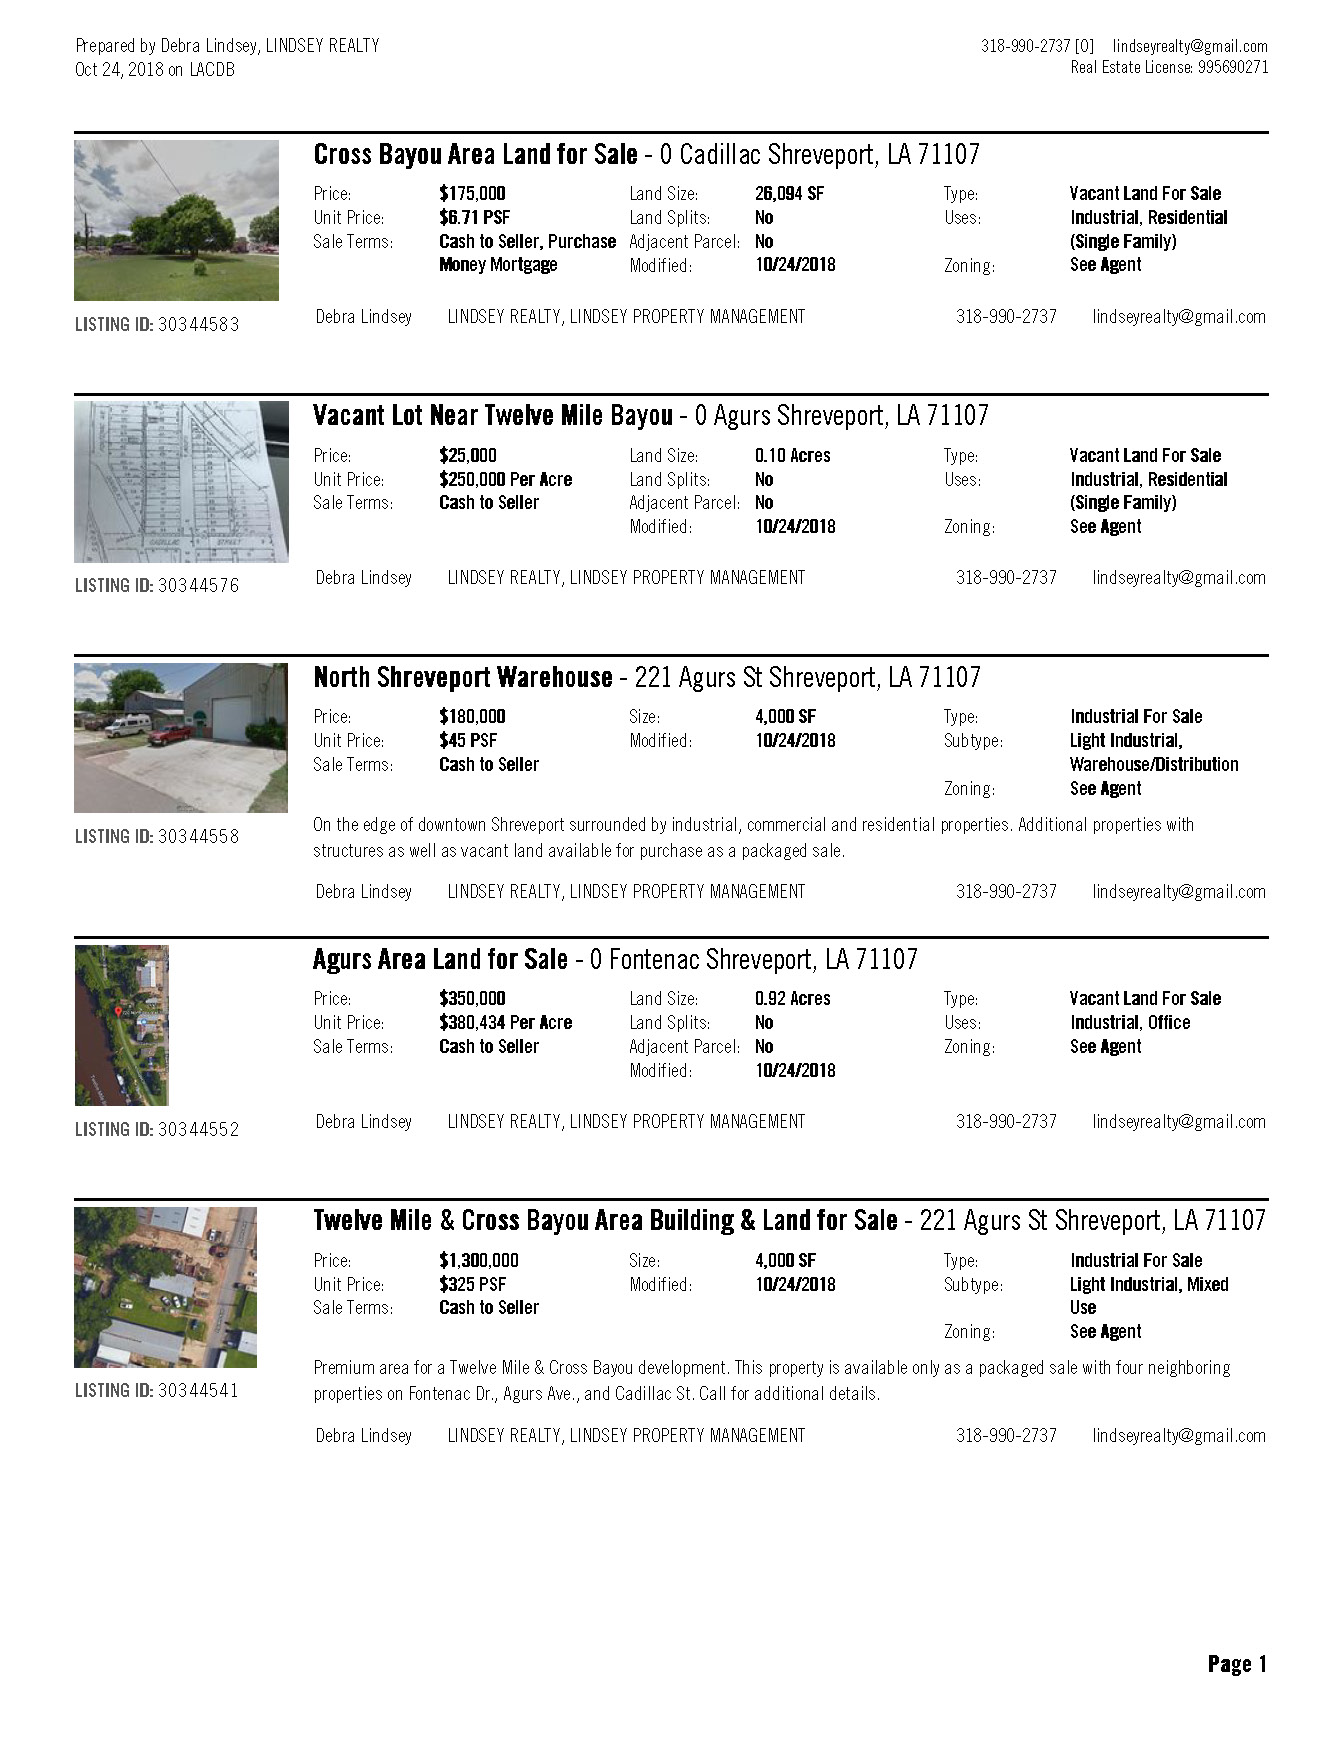 Commercial Listings | Debra Lindsey | 318-990-2737